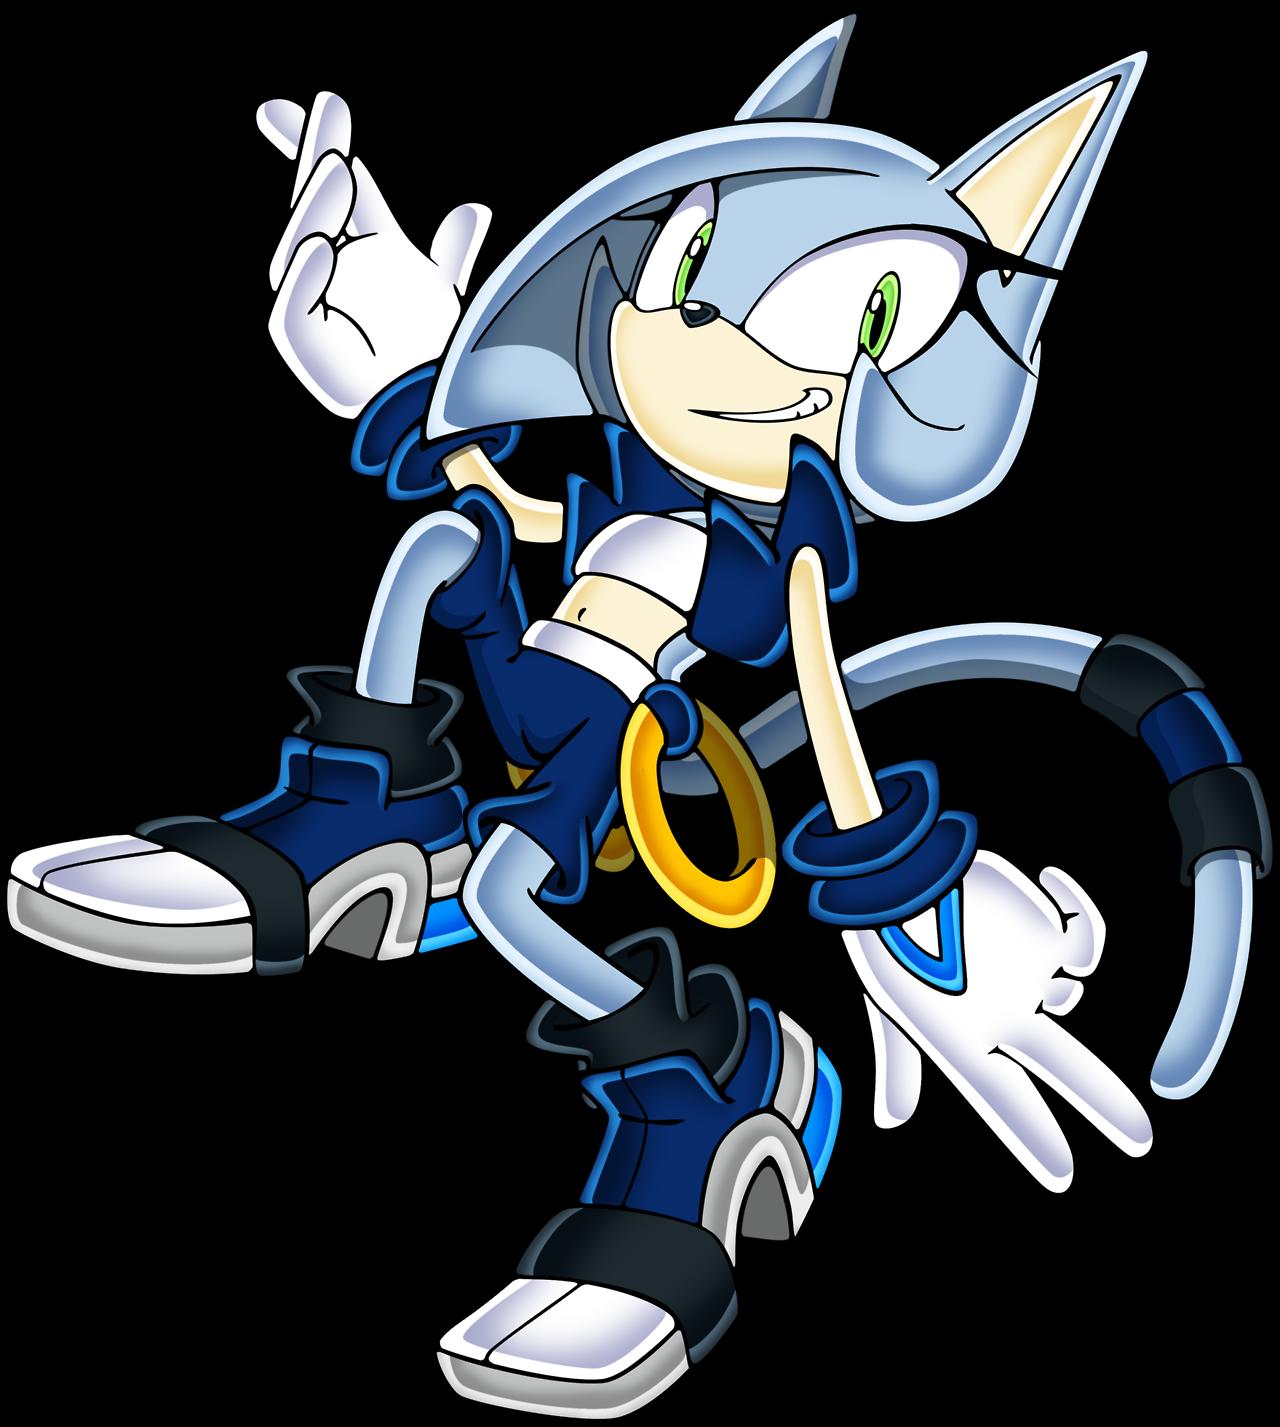 Tails the fox x Daniela - Sonic Fan Characters (recolors